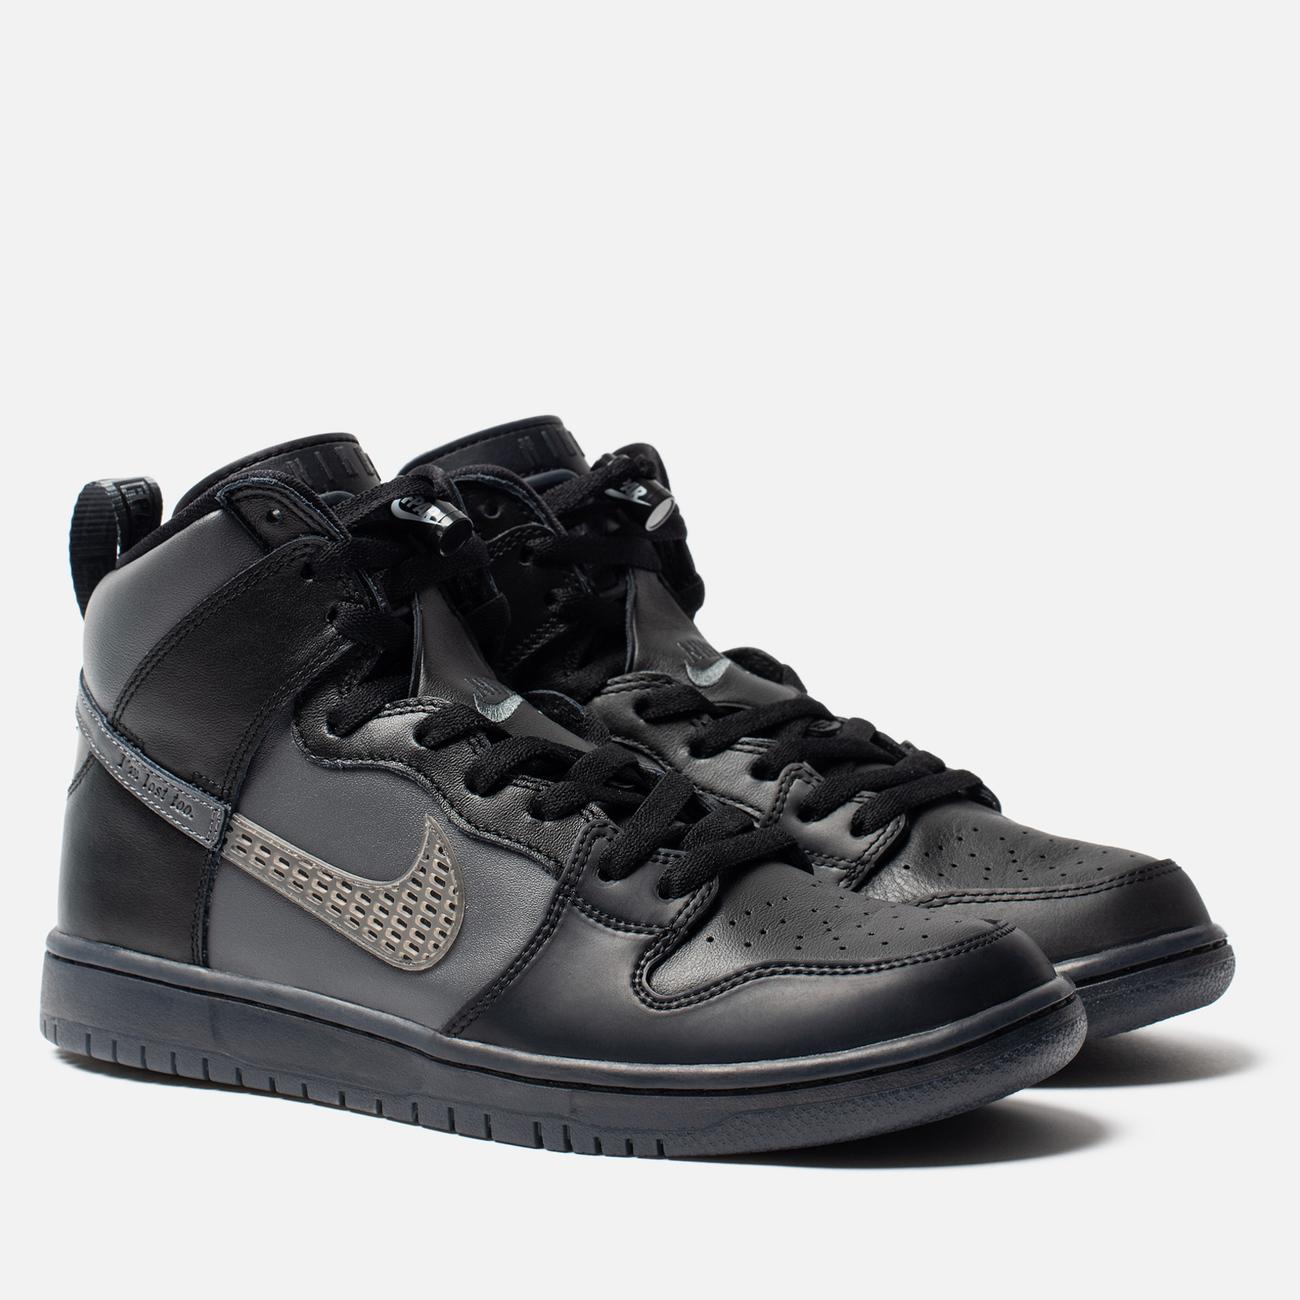 Кроссовки Nike SB x FPAR Dunk High Pro Premium QS Black/Dark Grey/Black